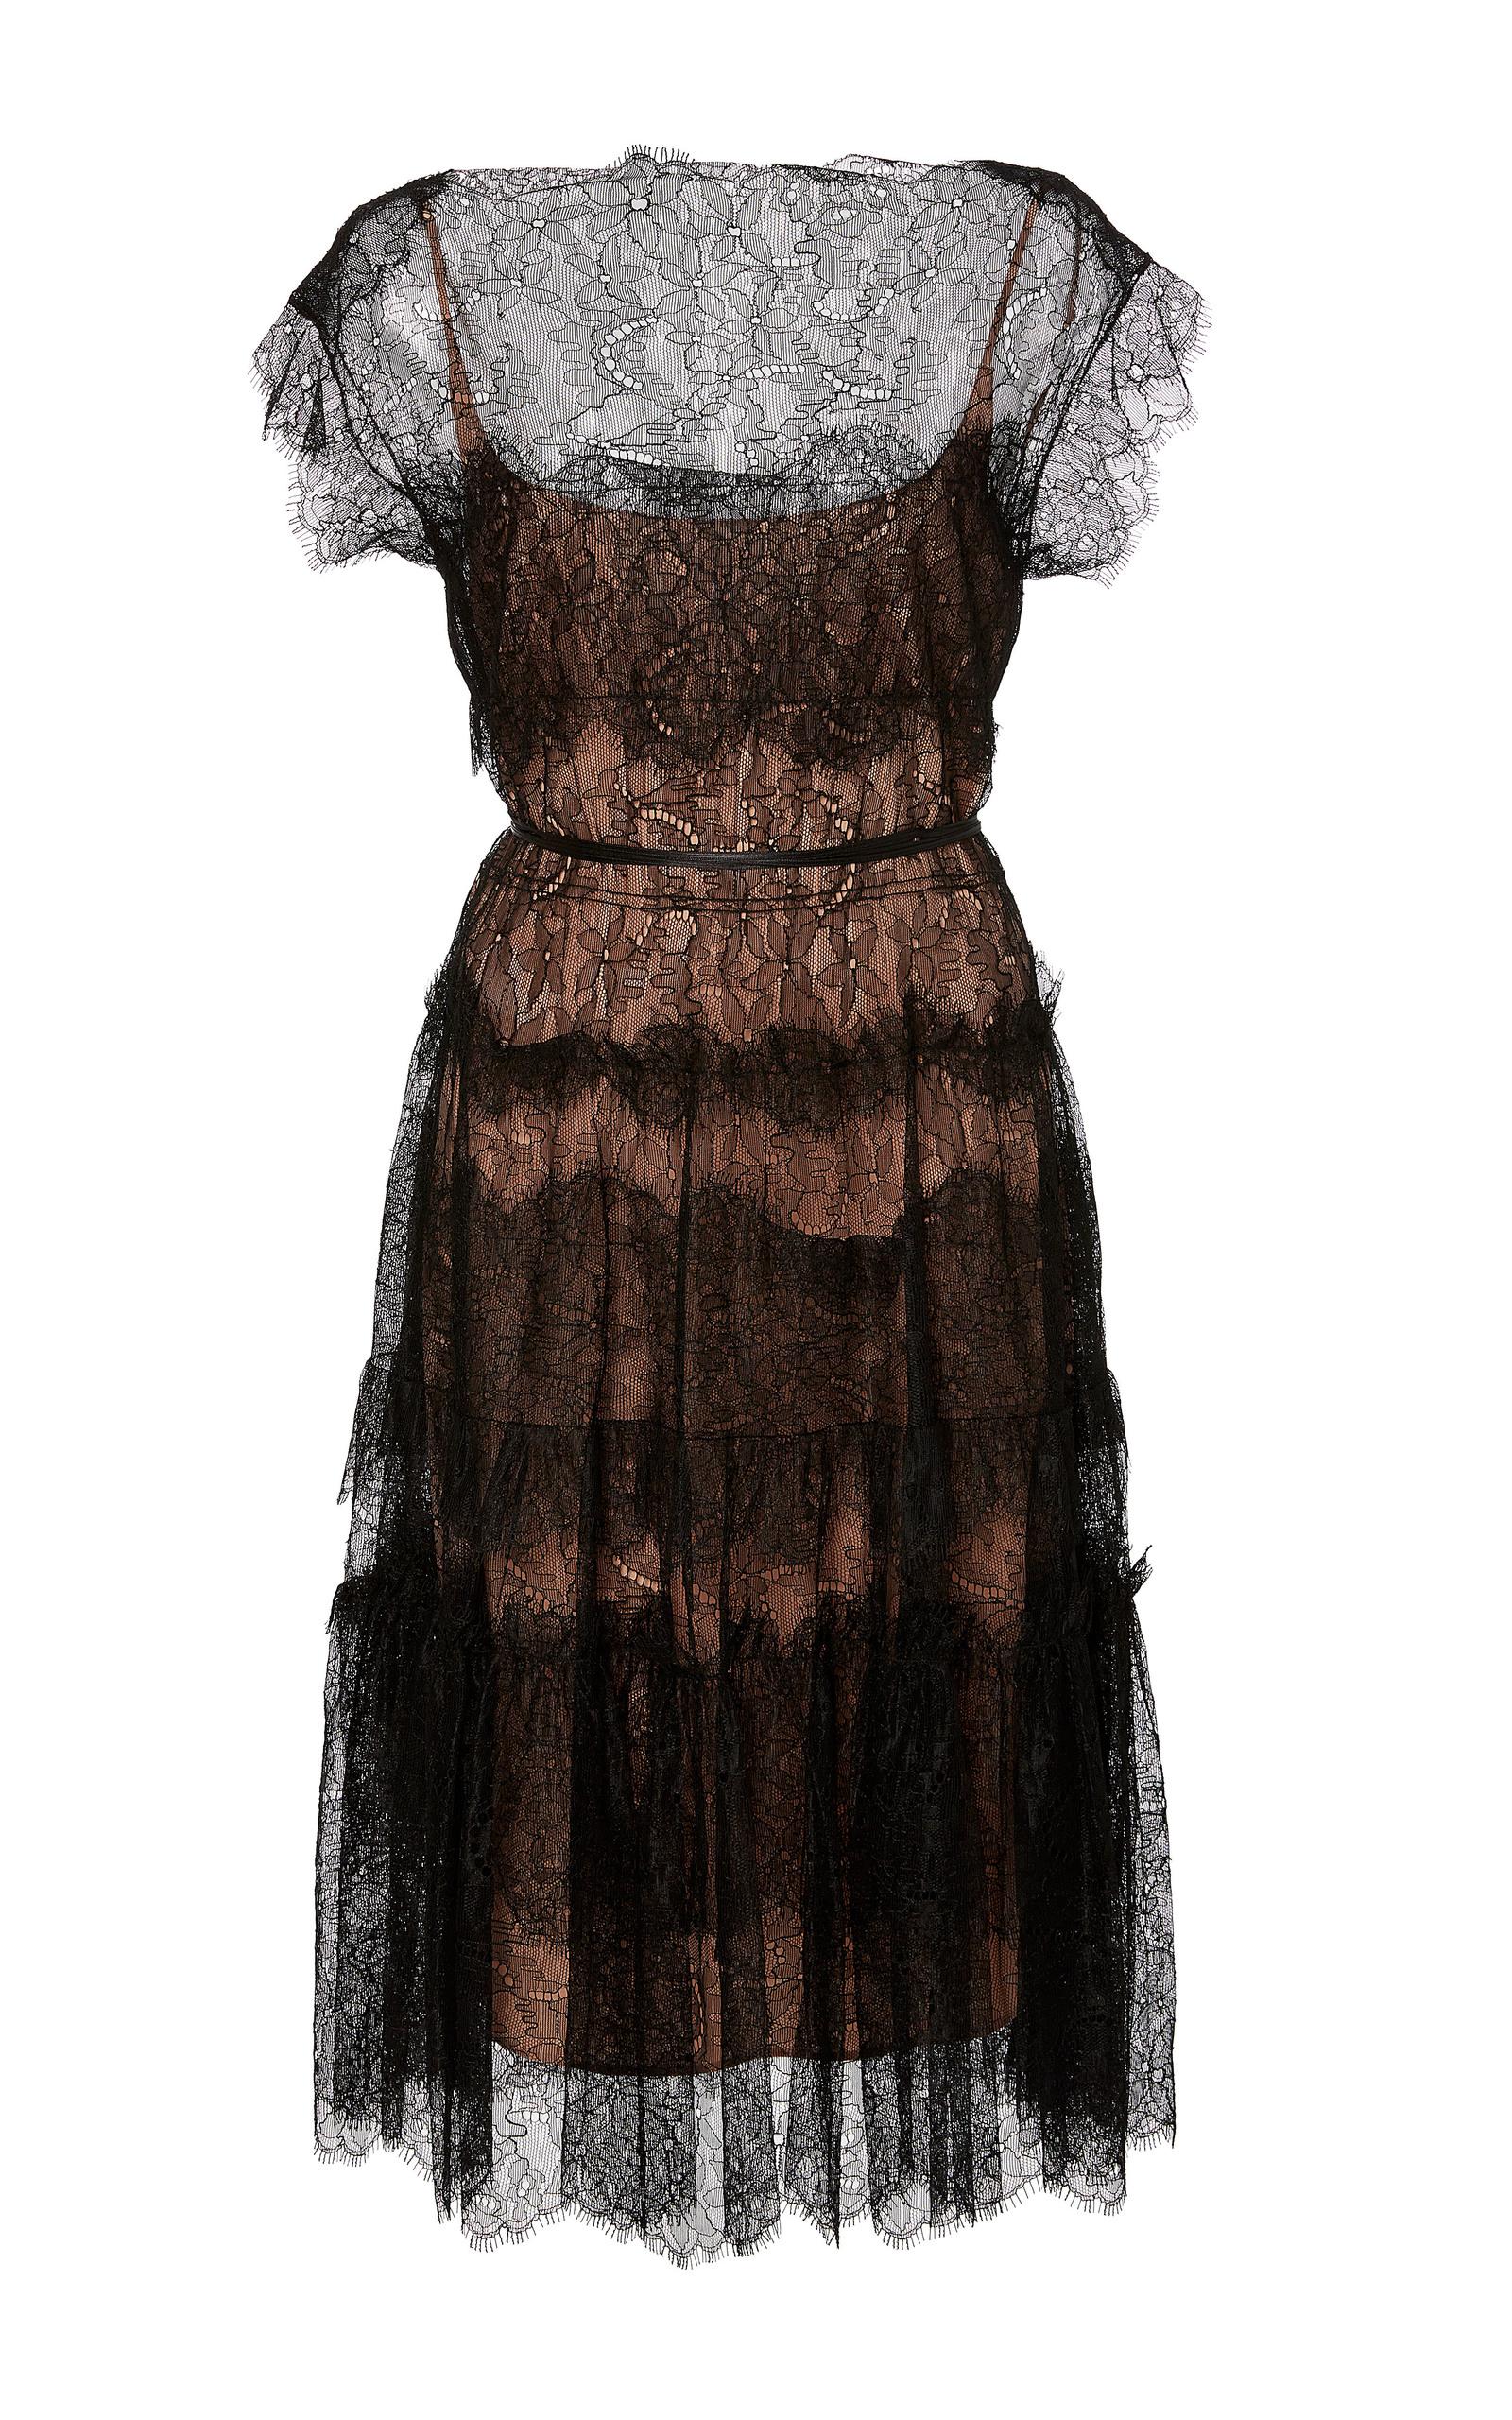 Paule Ka chantilly lace shortsleeved dress Outlet Deals 100% Authentic For Sale Comfortable For Sale Explore Cheap Classic dDLvzxviP